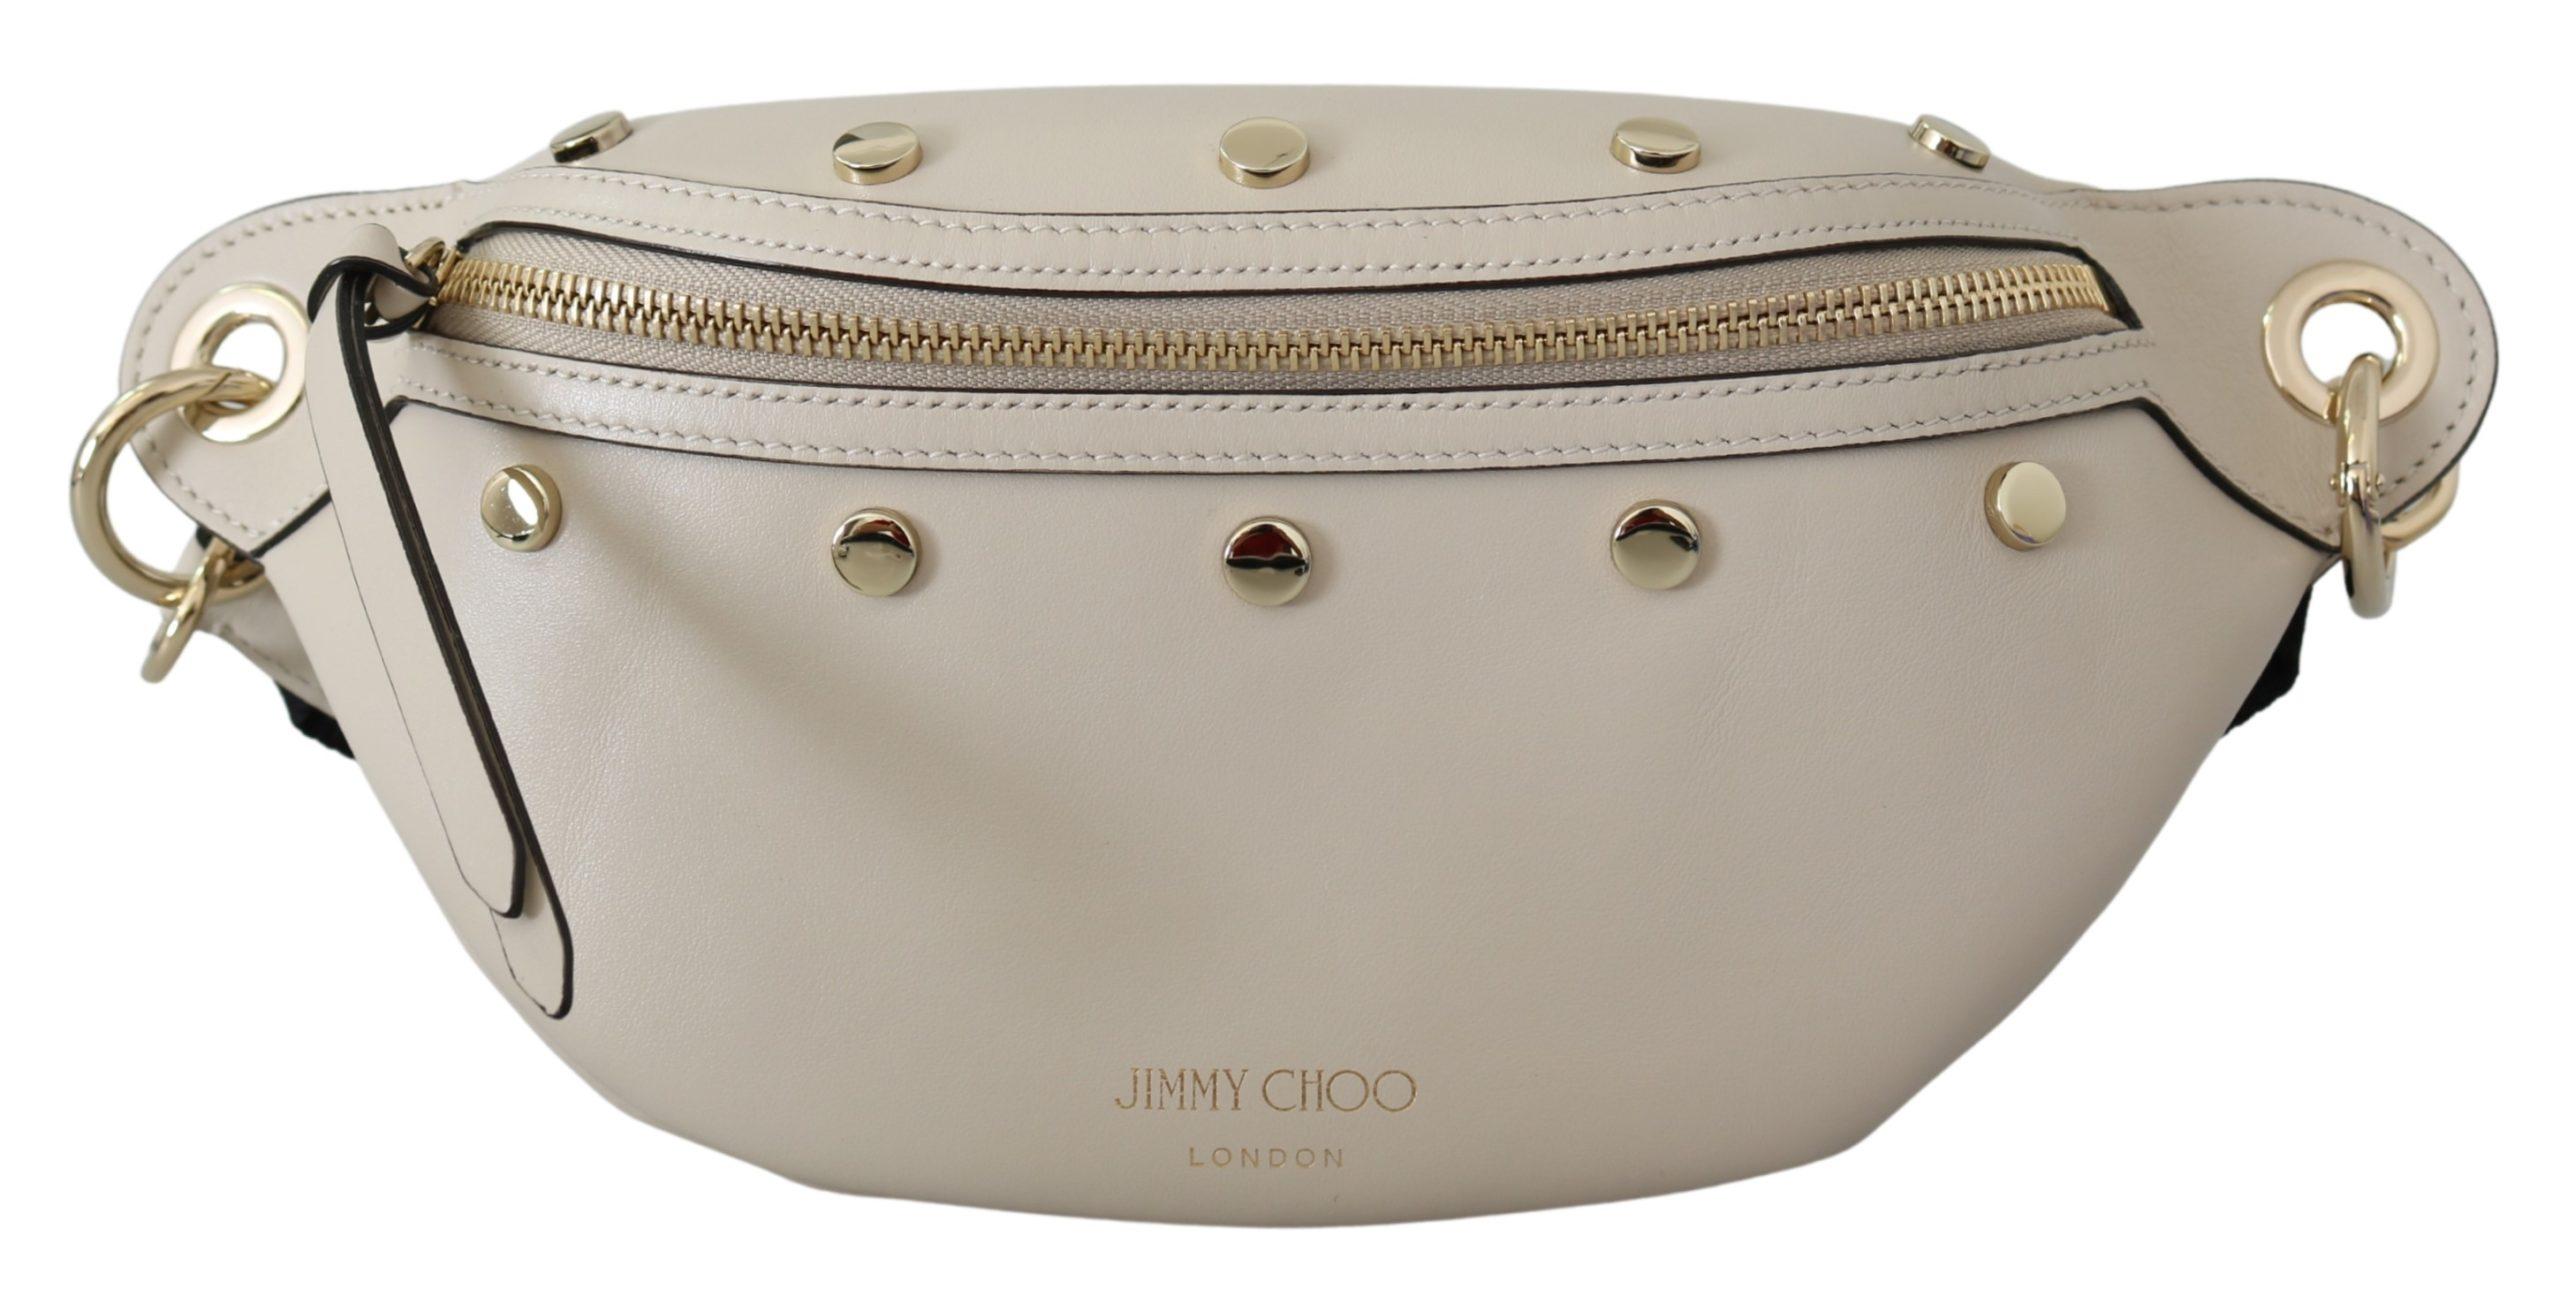 Jimmy Choo Women's Lockett Lamb Belt Bag Cream 1436320